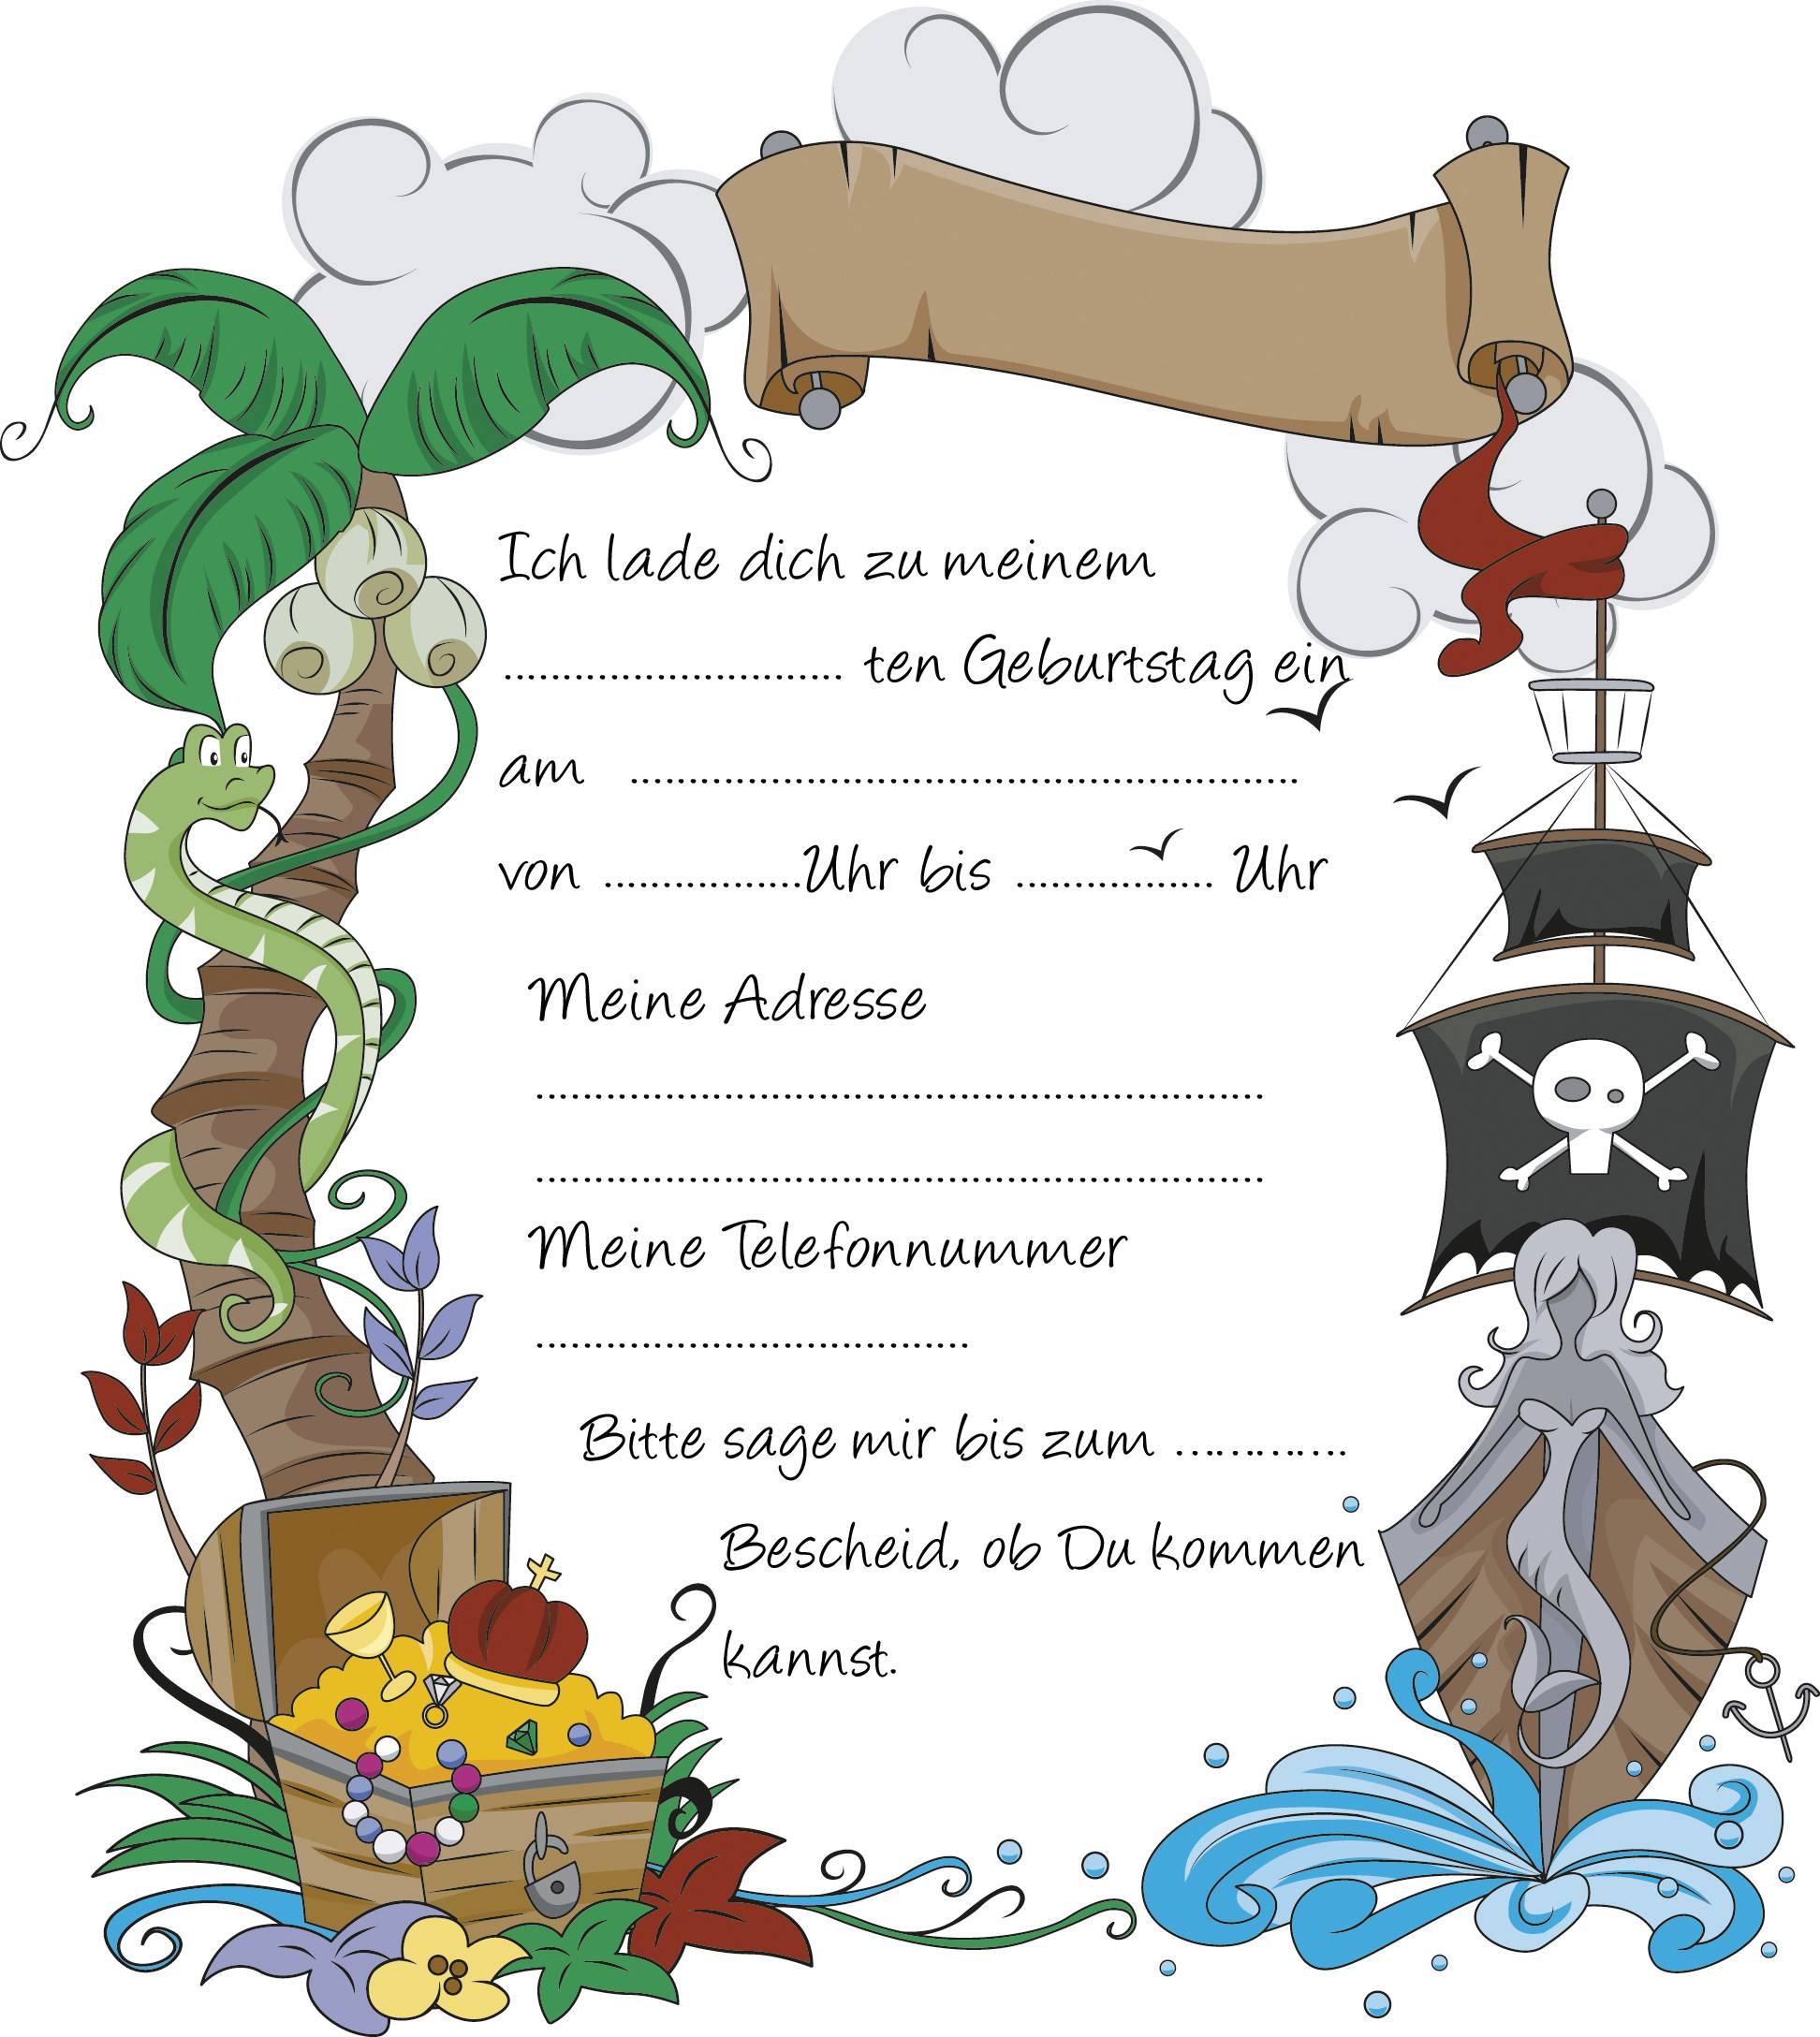 Related Image For Einladung Kindergeburtstag Text 1. Geburtstag